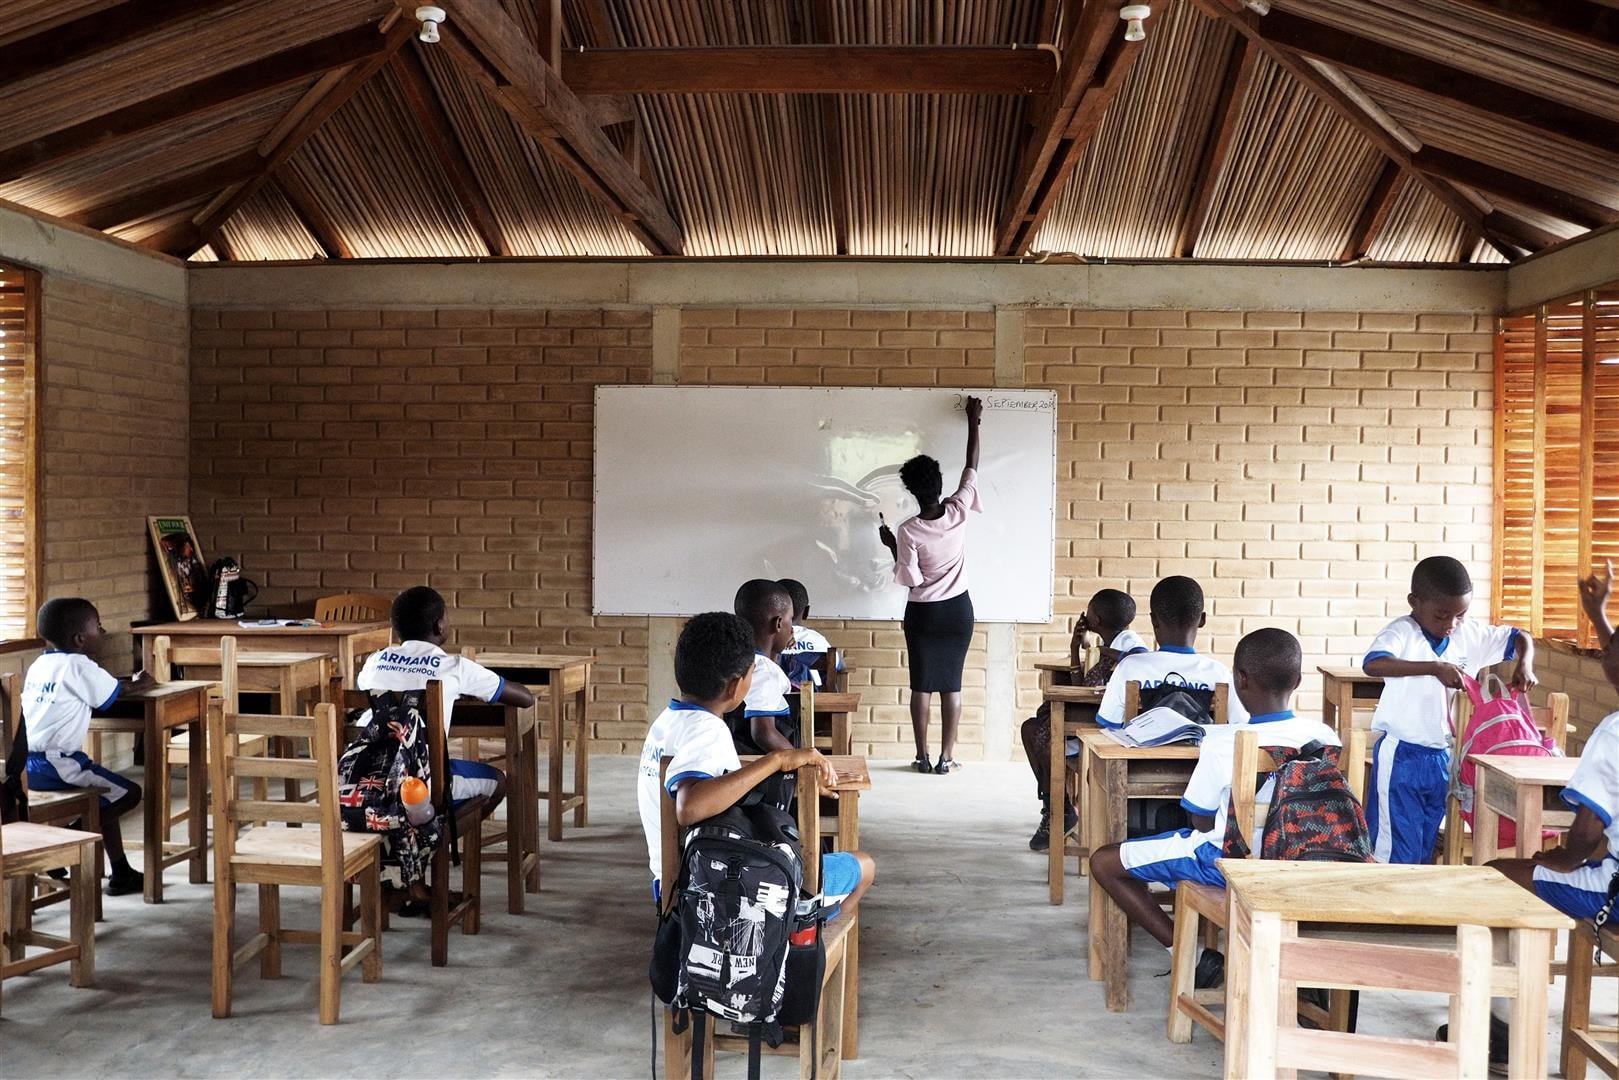 the teacher writes on the blackboard